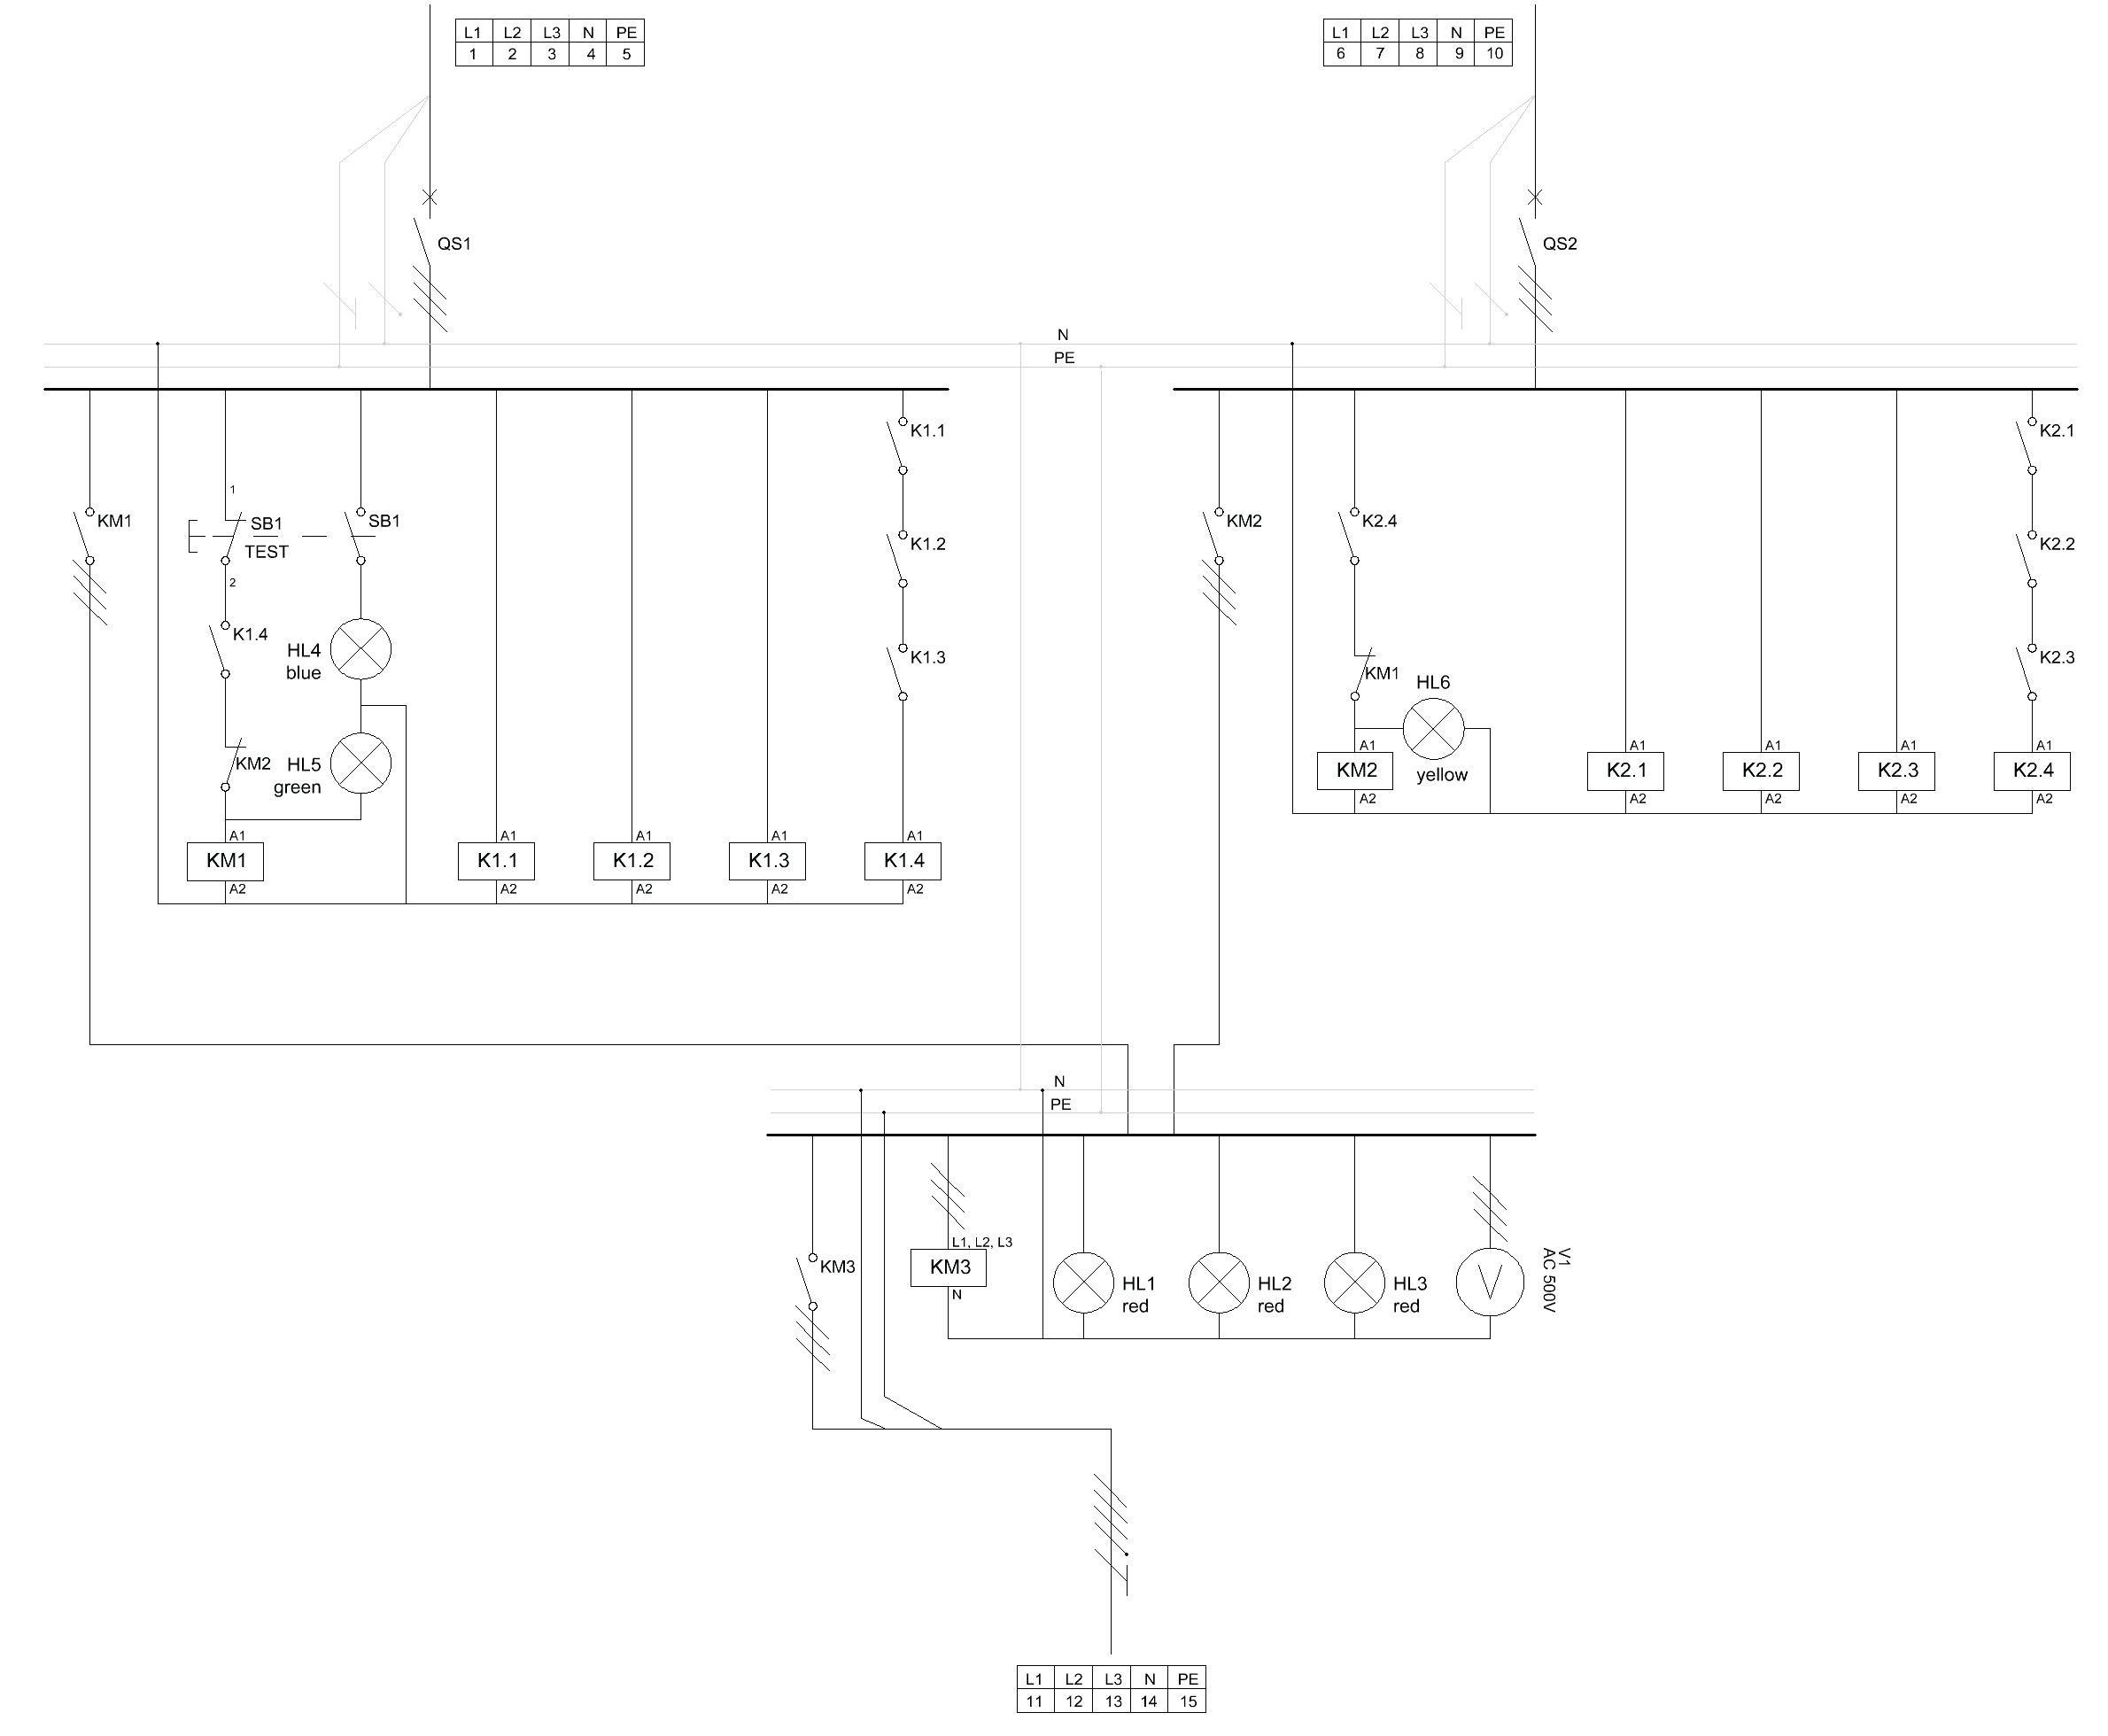 Generac Automatic Transfer Switch Wiring Diagram Valid Generac Ats - Generac 100 Amp Automatic Transfer Switch Wiring Diagram